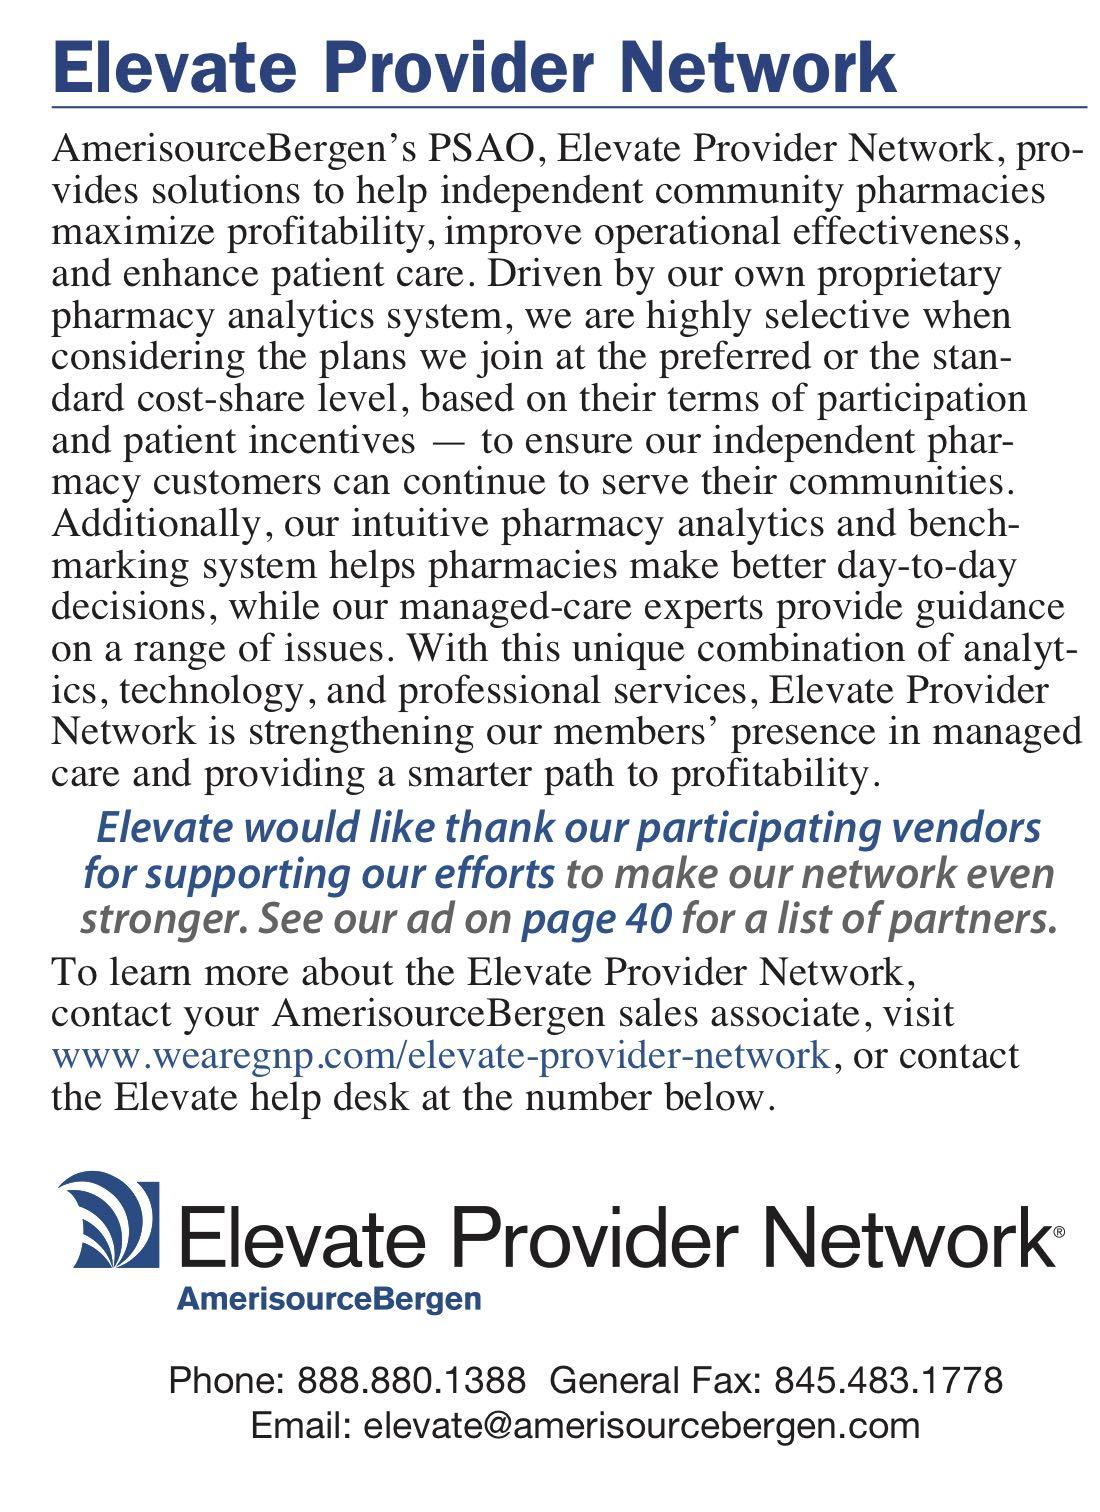 ComputerTalk_2019_Pharmacy_Buyers_Guide_40_Elevate_Provider_Network